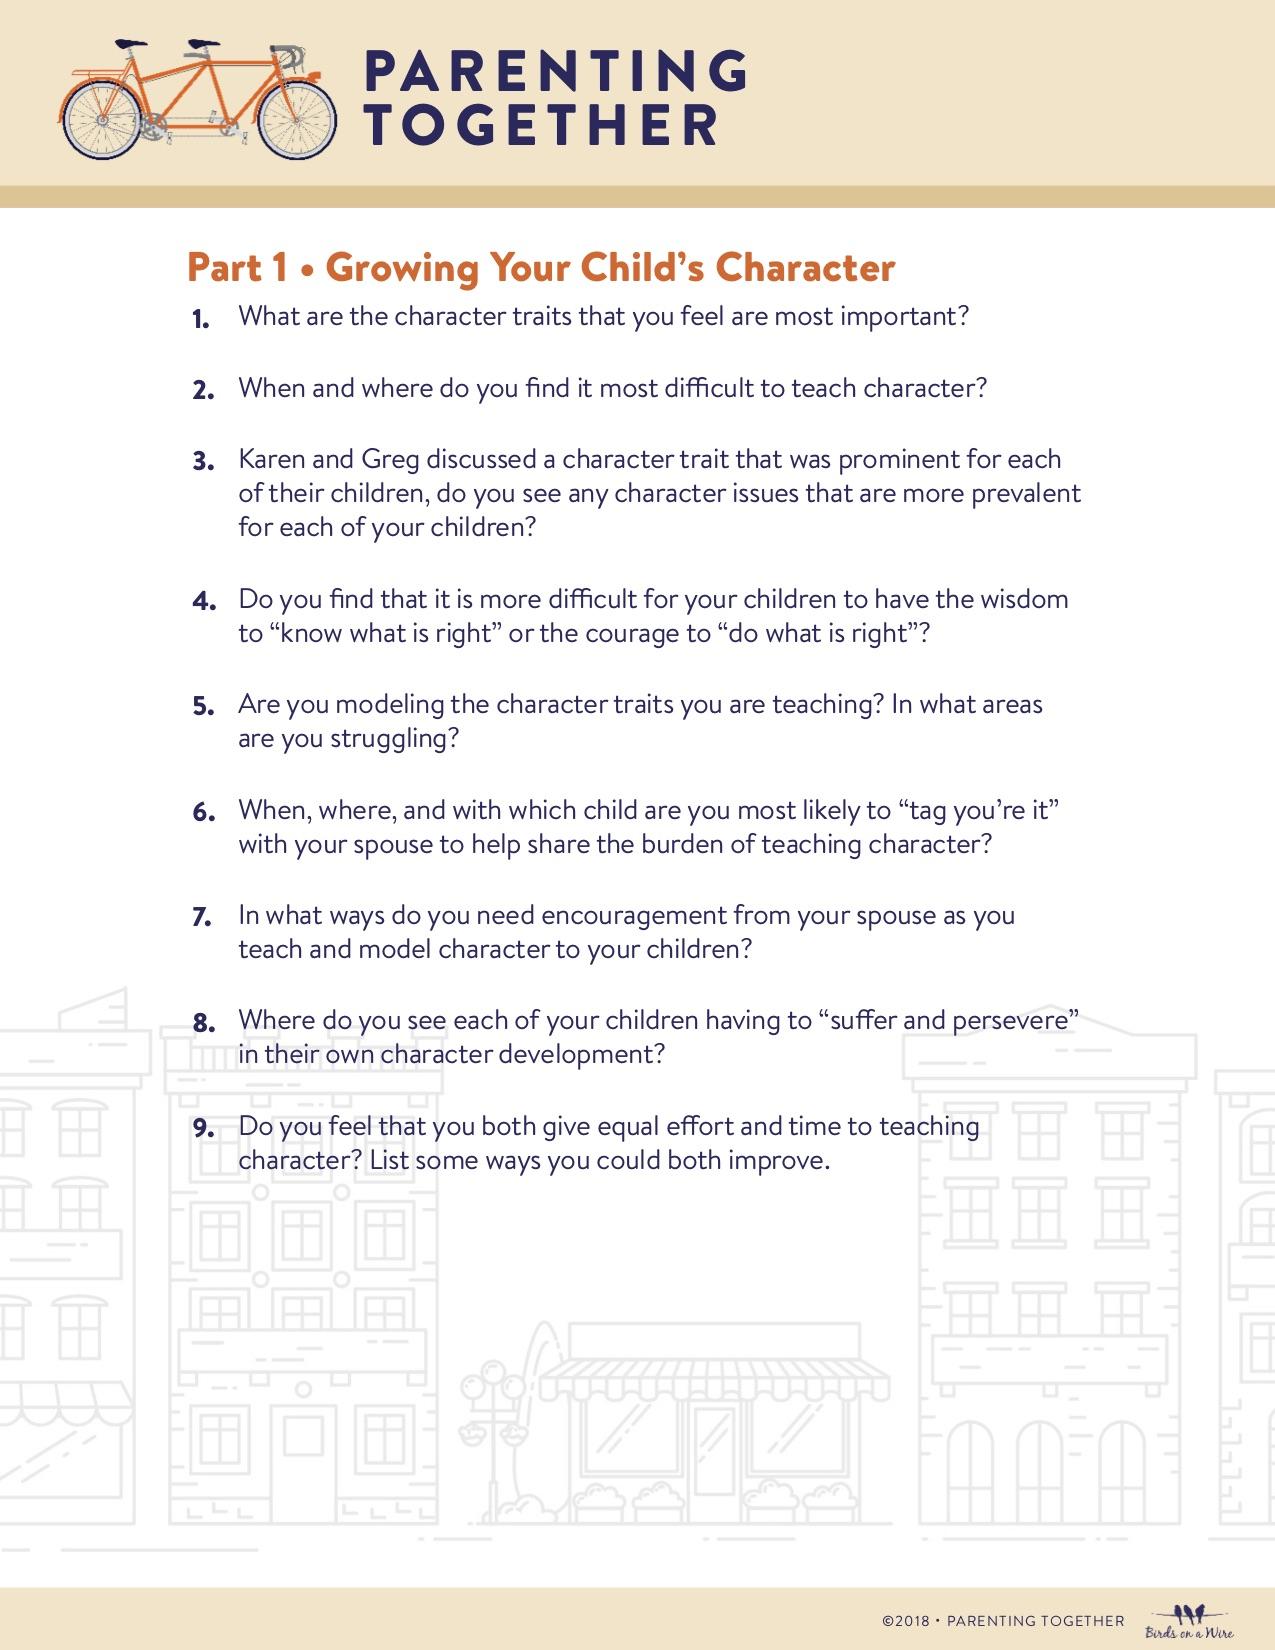 parenting-together-page-1.jpg